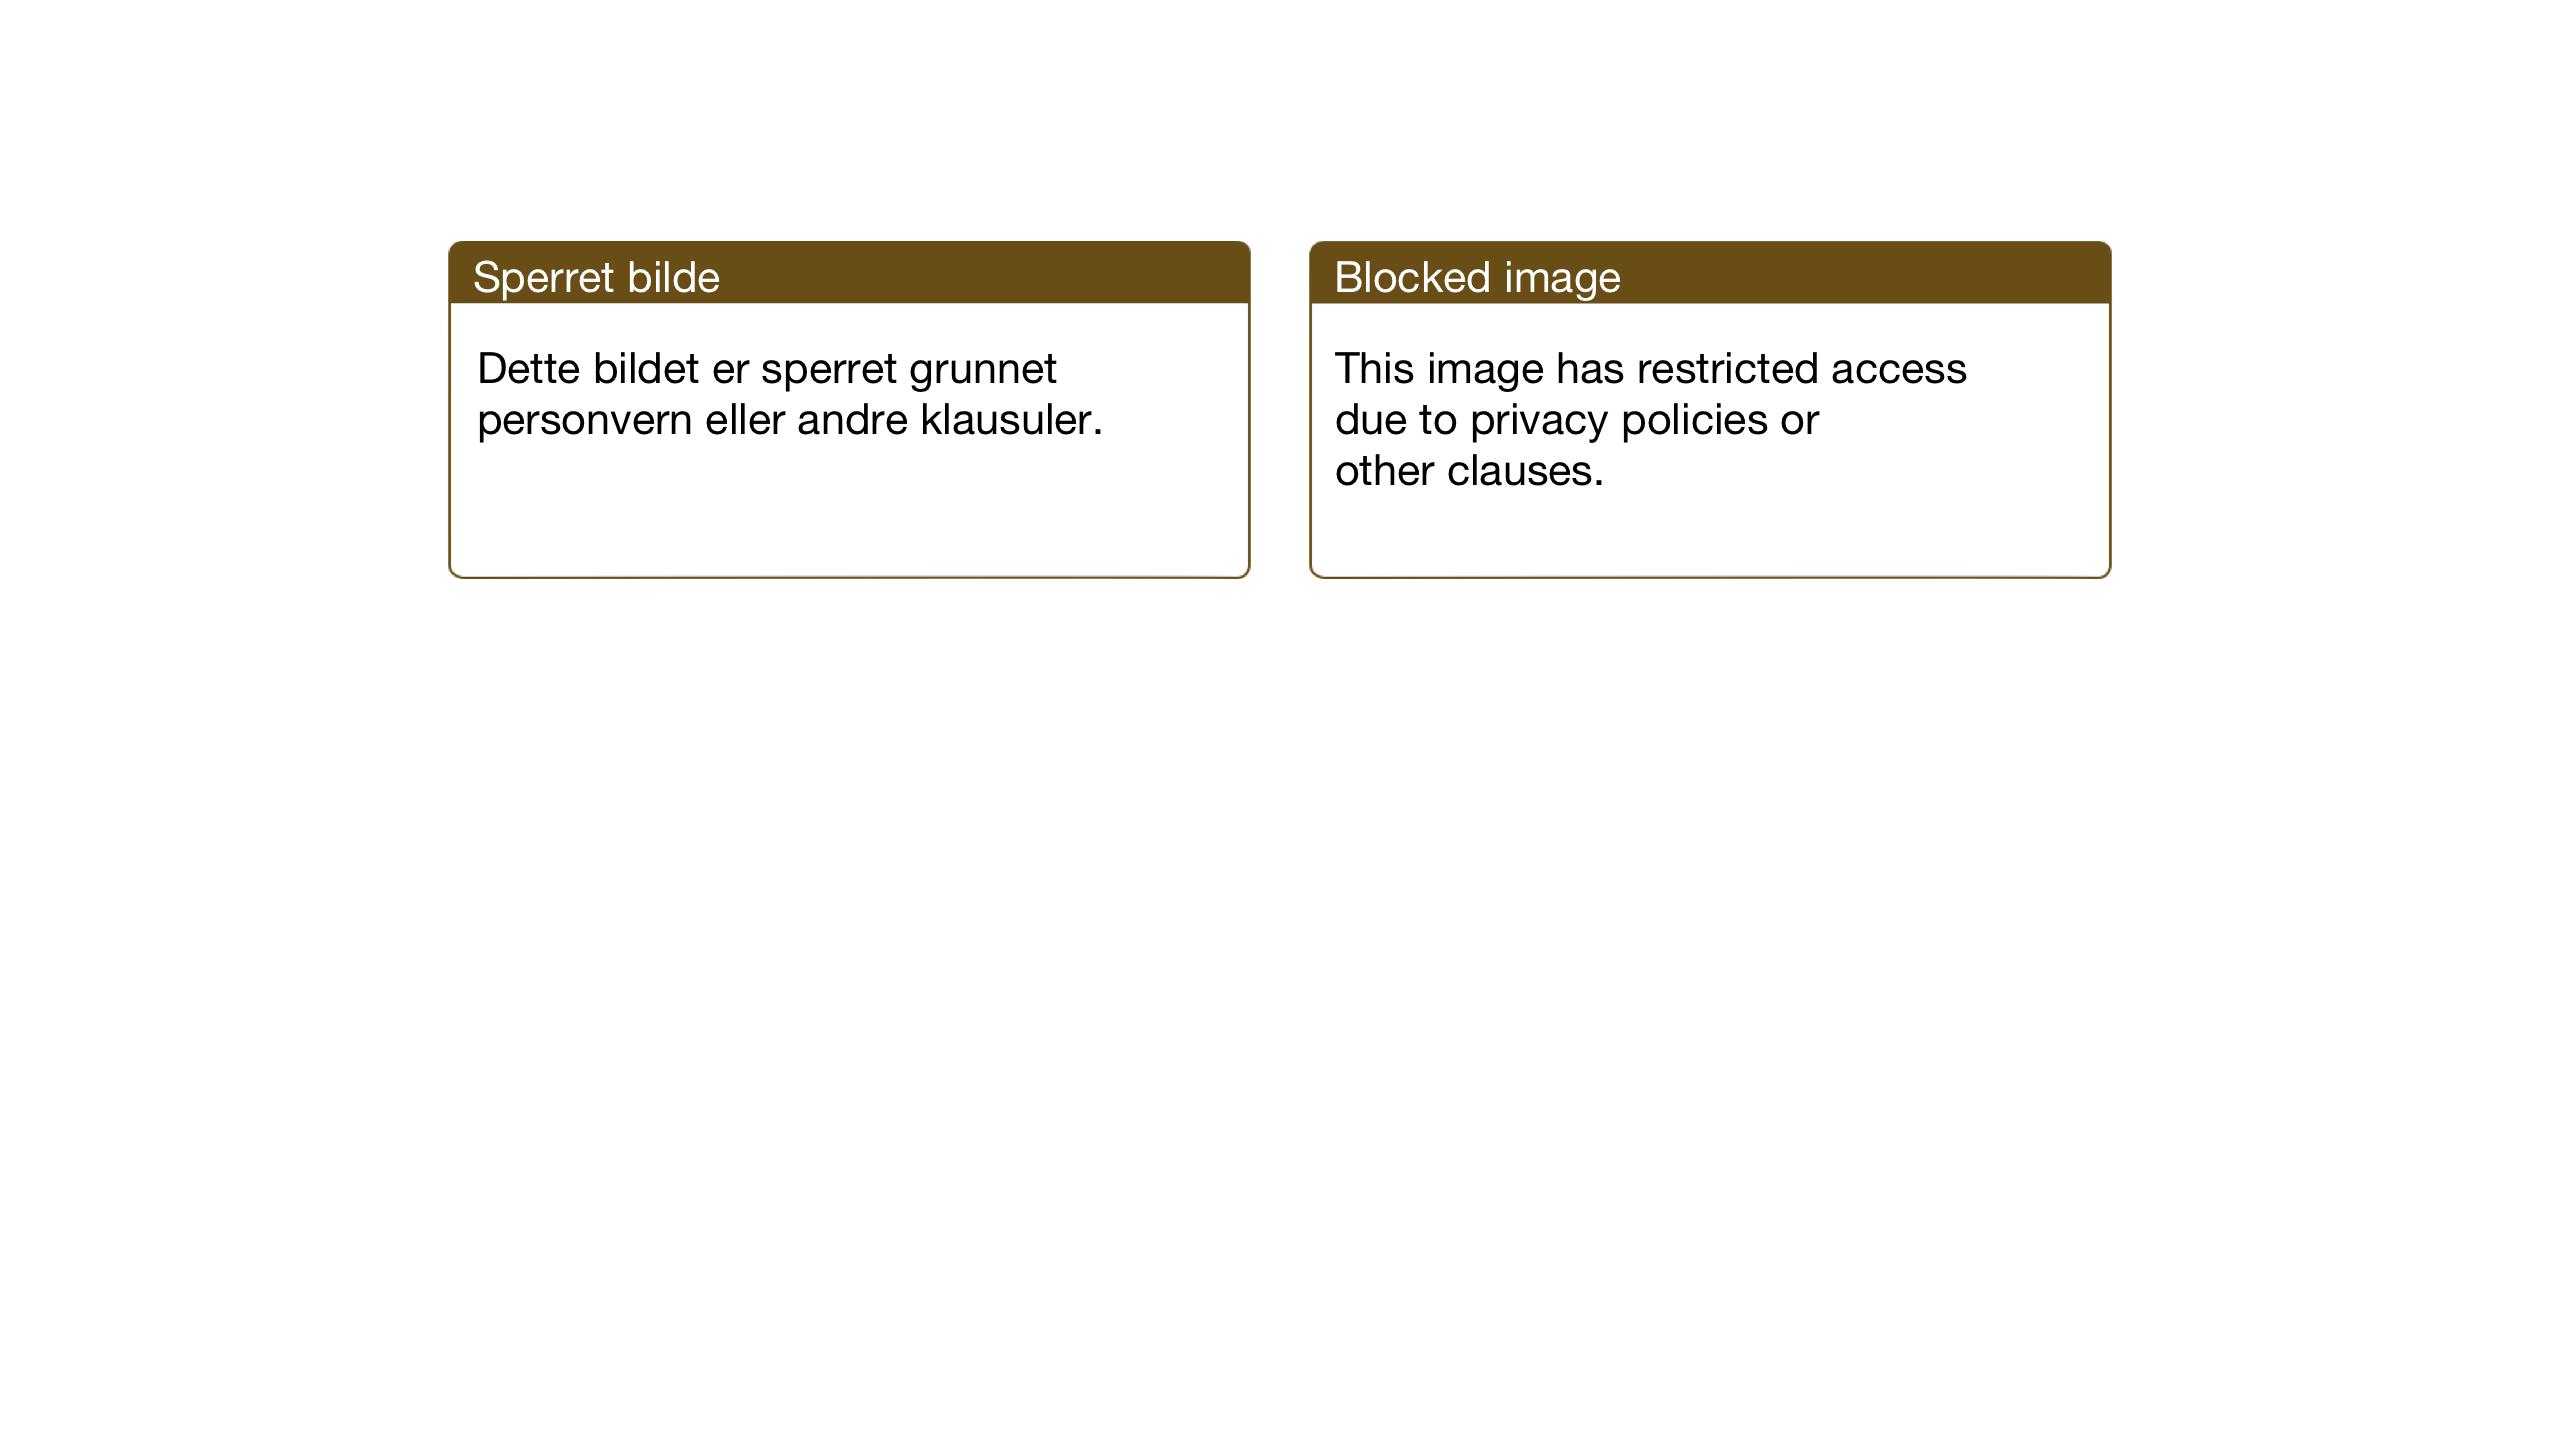 SAH, Vardal prestekontor, H/Ha/Haa/L0018: Ministerialbok nr. 18, 1930-1945, s. 4